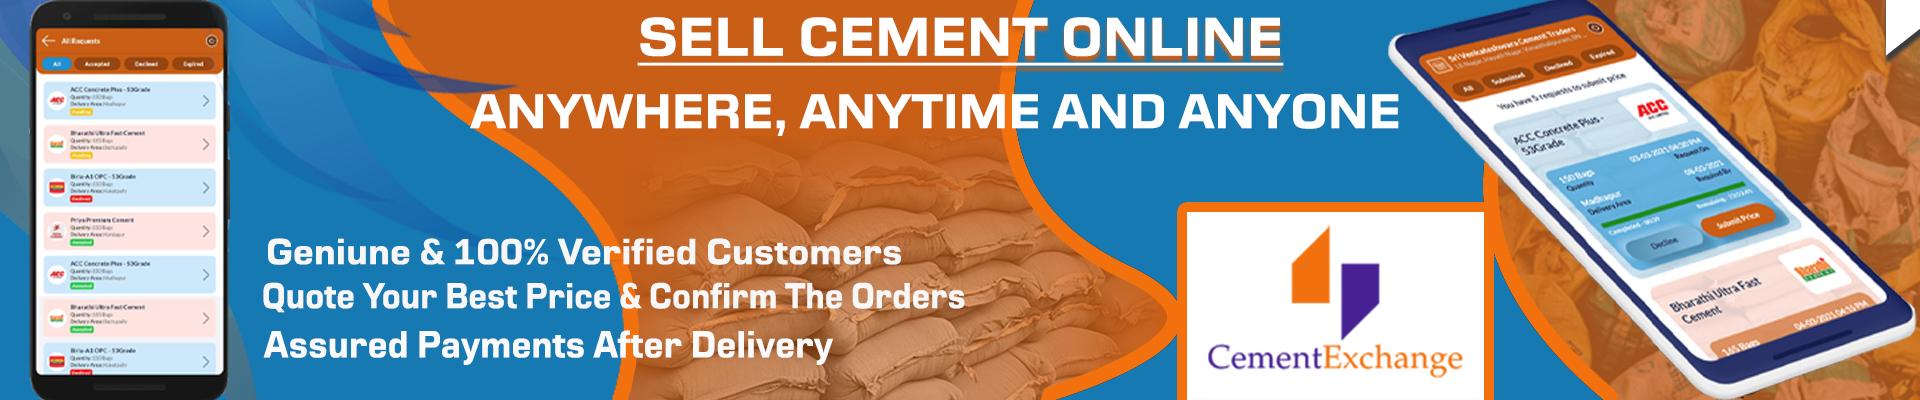 Cement_Exchange